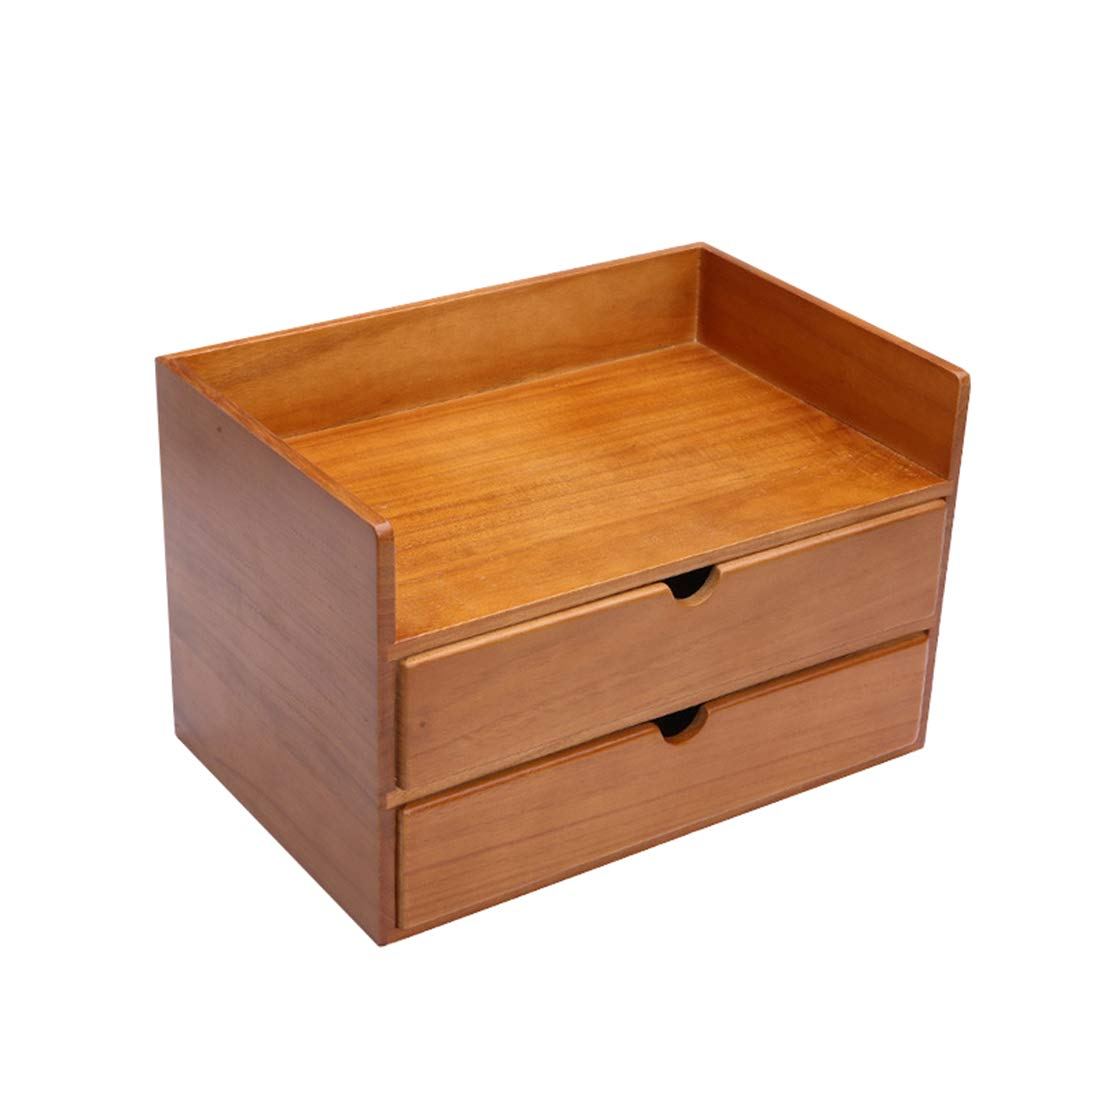 KERVINJESSIE Exquisite Wooden Desktop Solid Wood Cosmetics Collection Box Drawer Type Sundries Jewellery Box (Color : Wood)